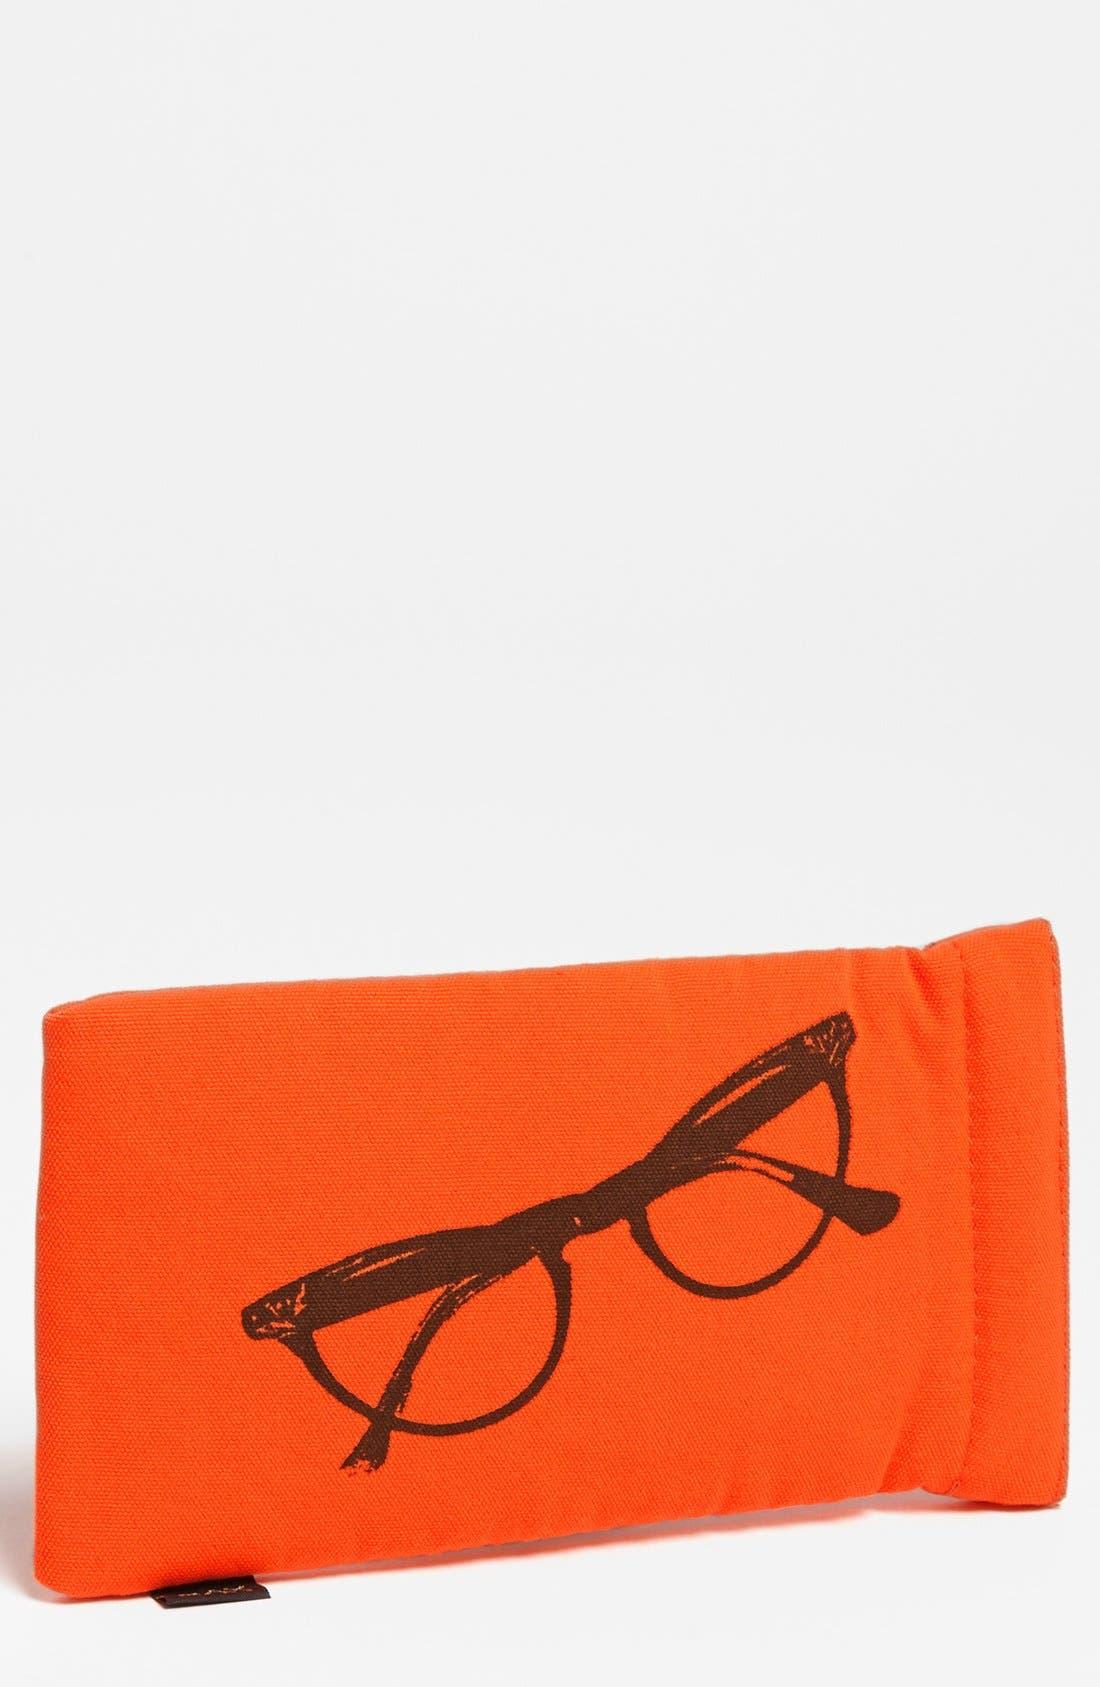 Main Image - Sax Eyewear Accessory Soft Sunglasses Case